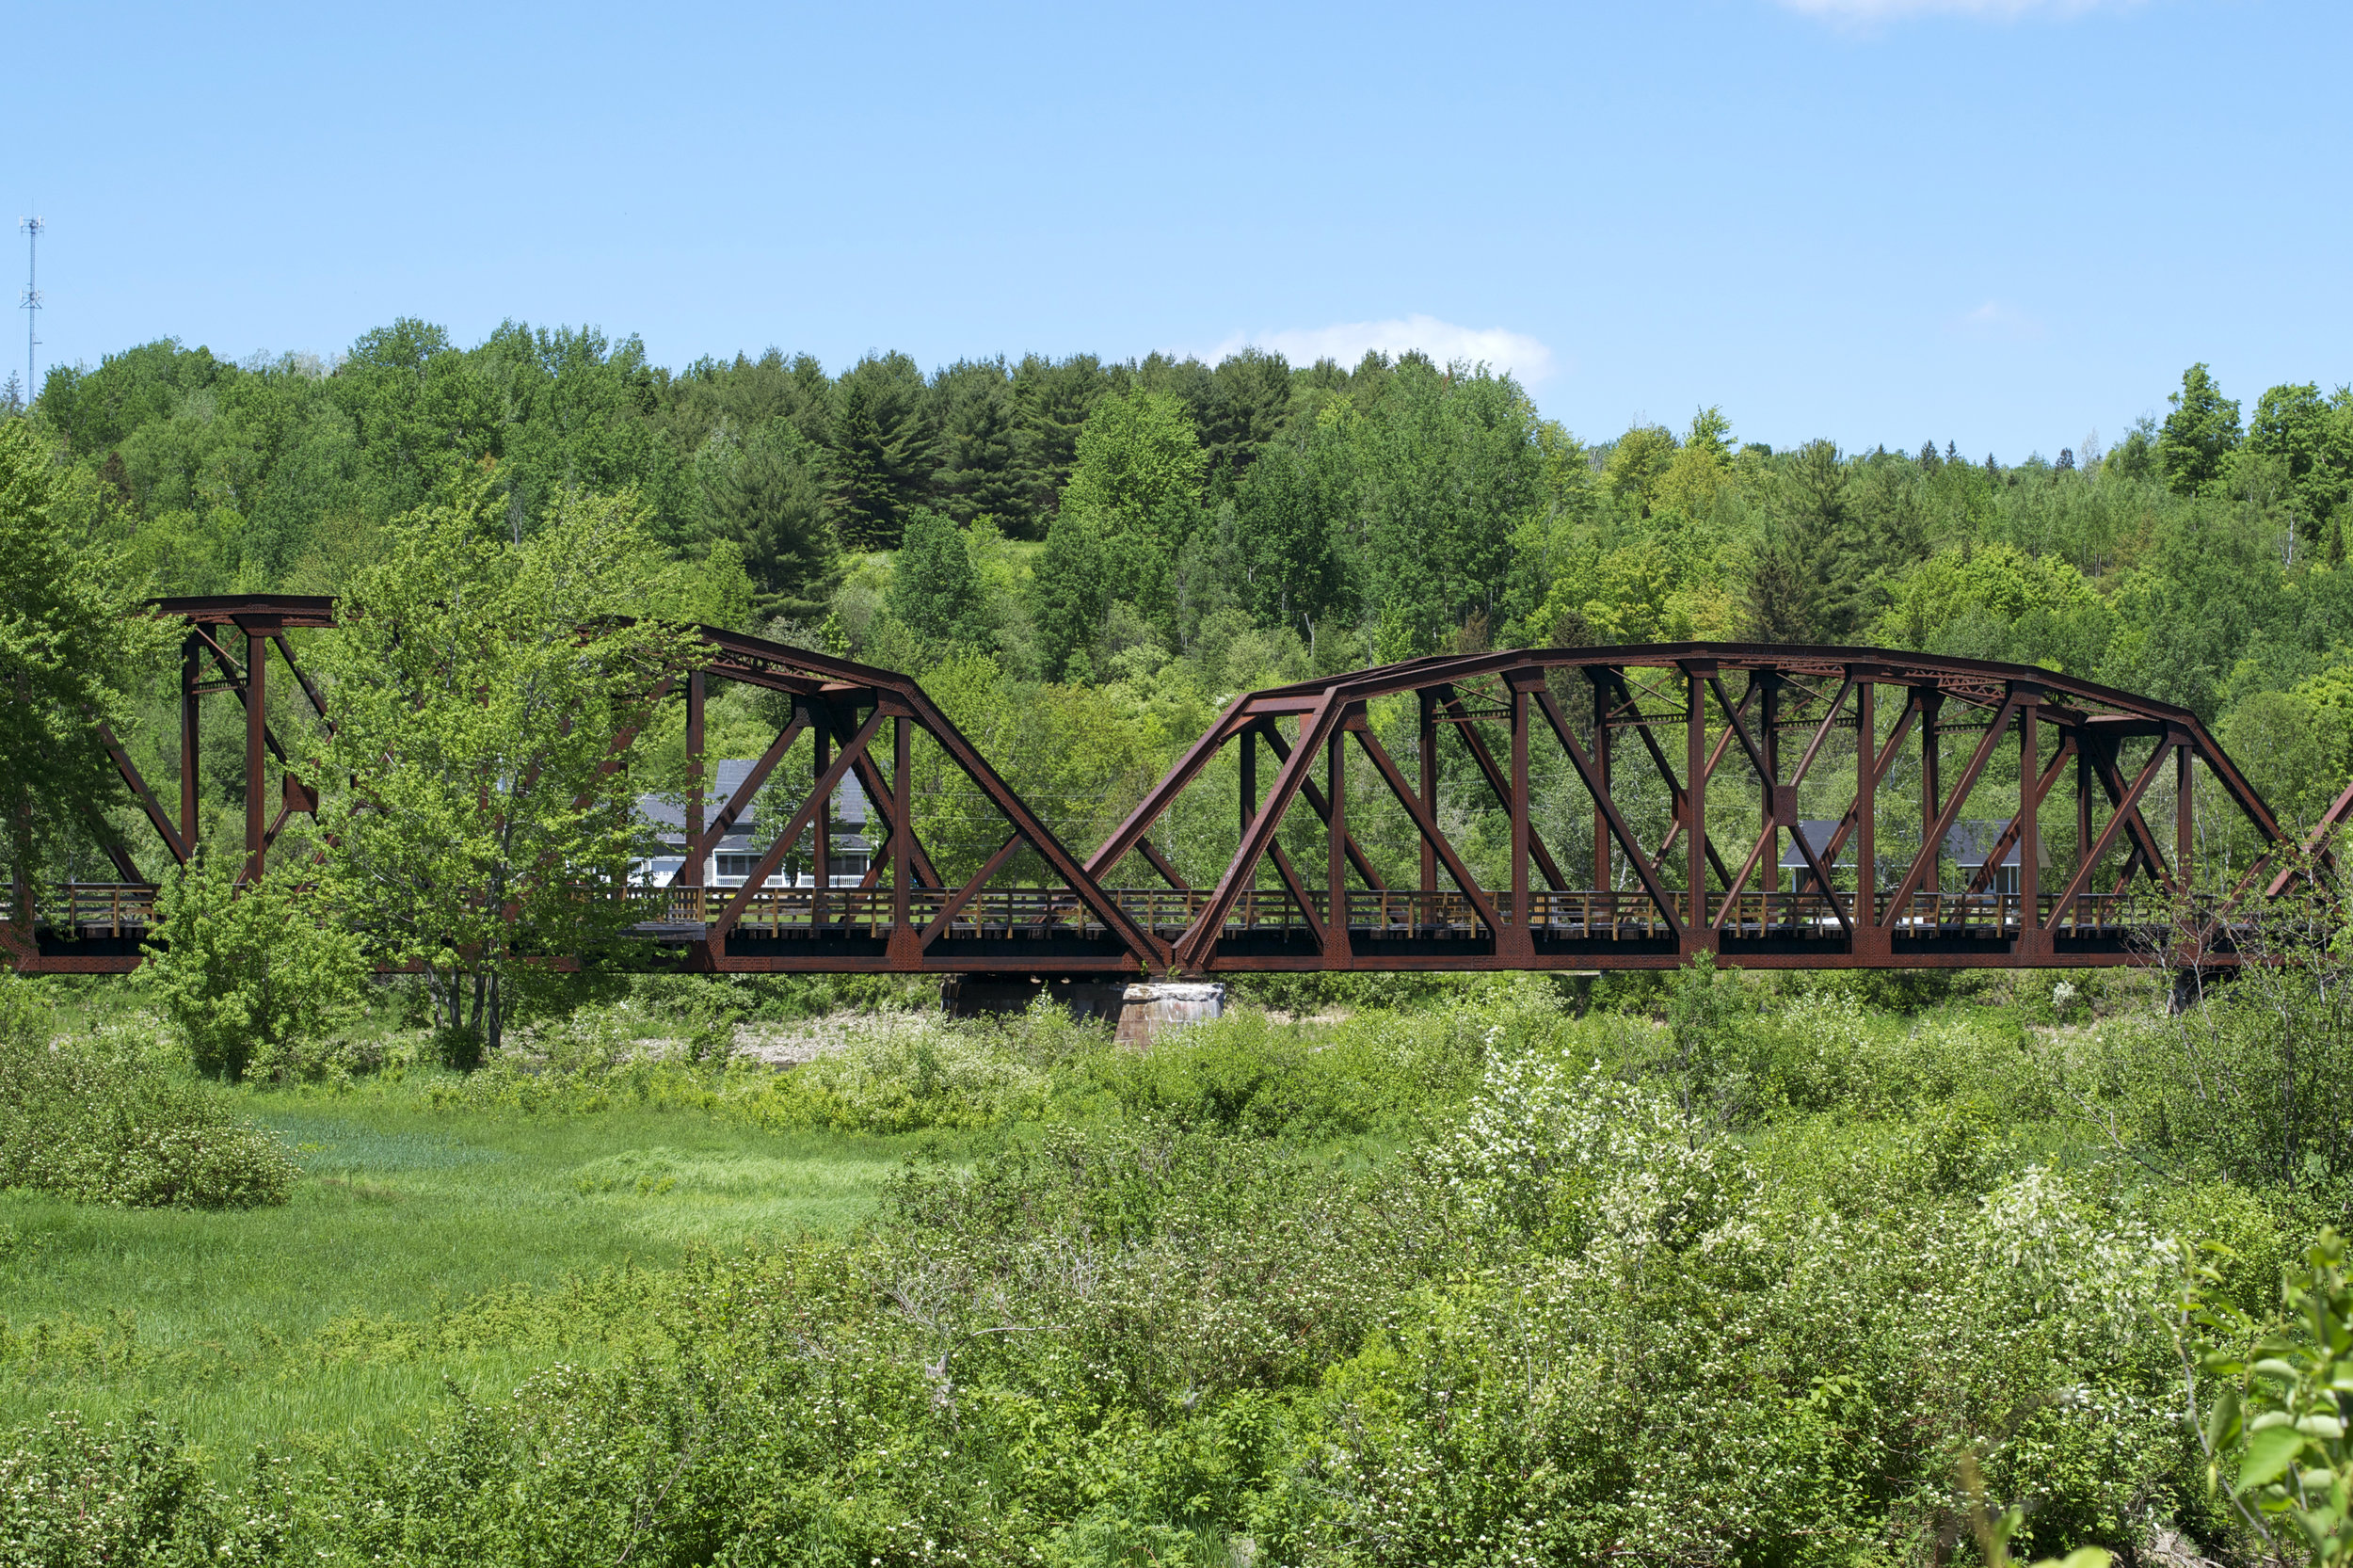 doaktown-train-bridge-in-bushes.jpg